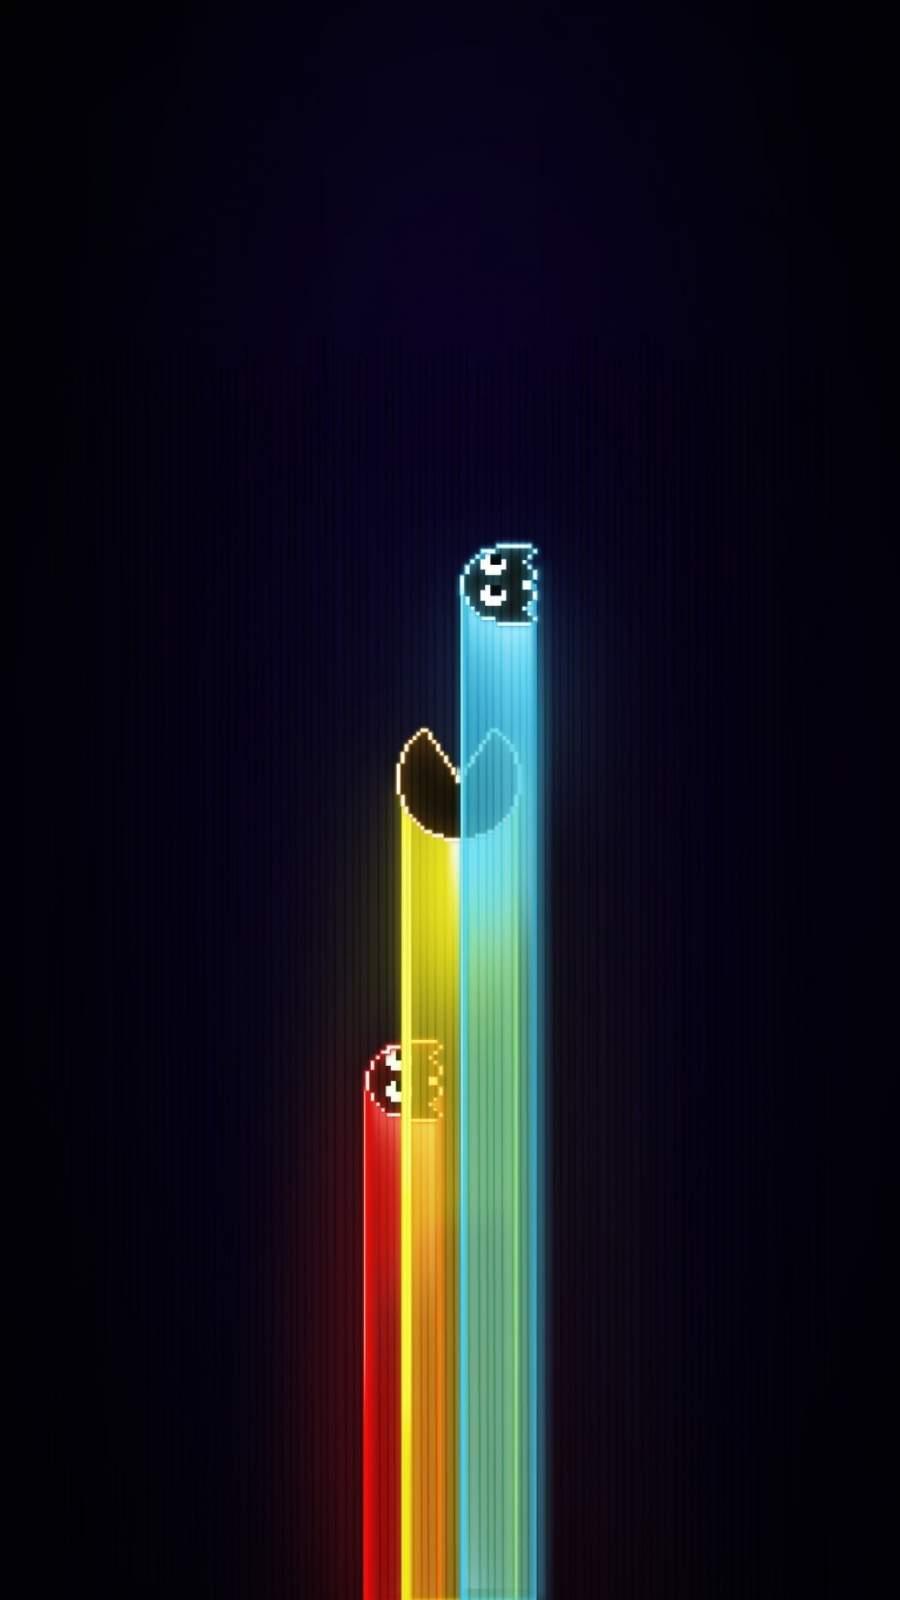 Pacman Amoled iPhone Wallpaper